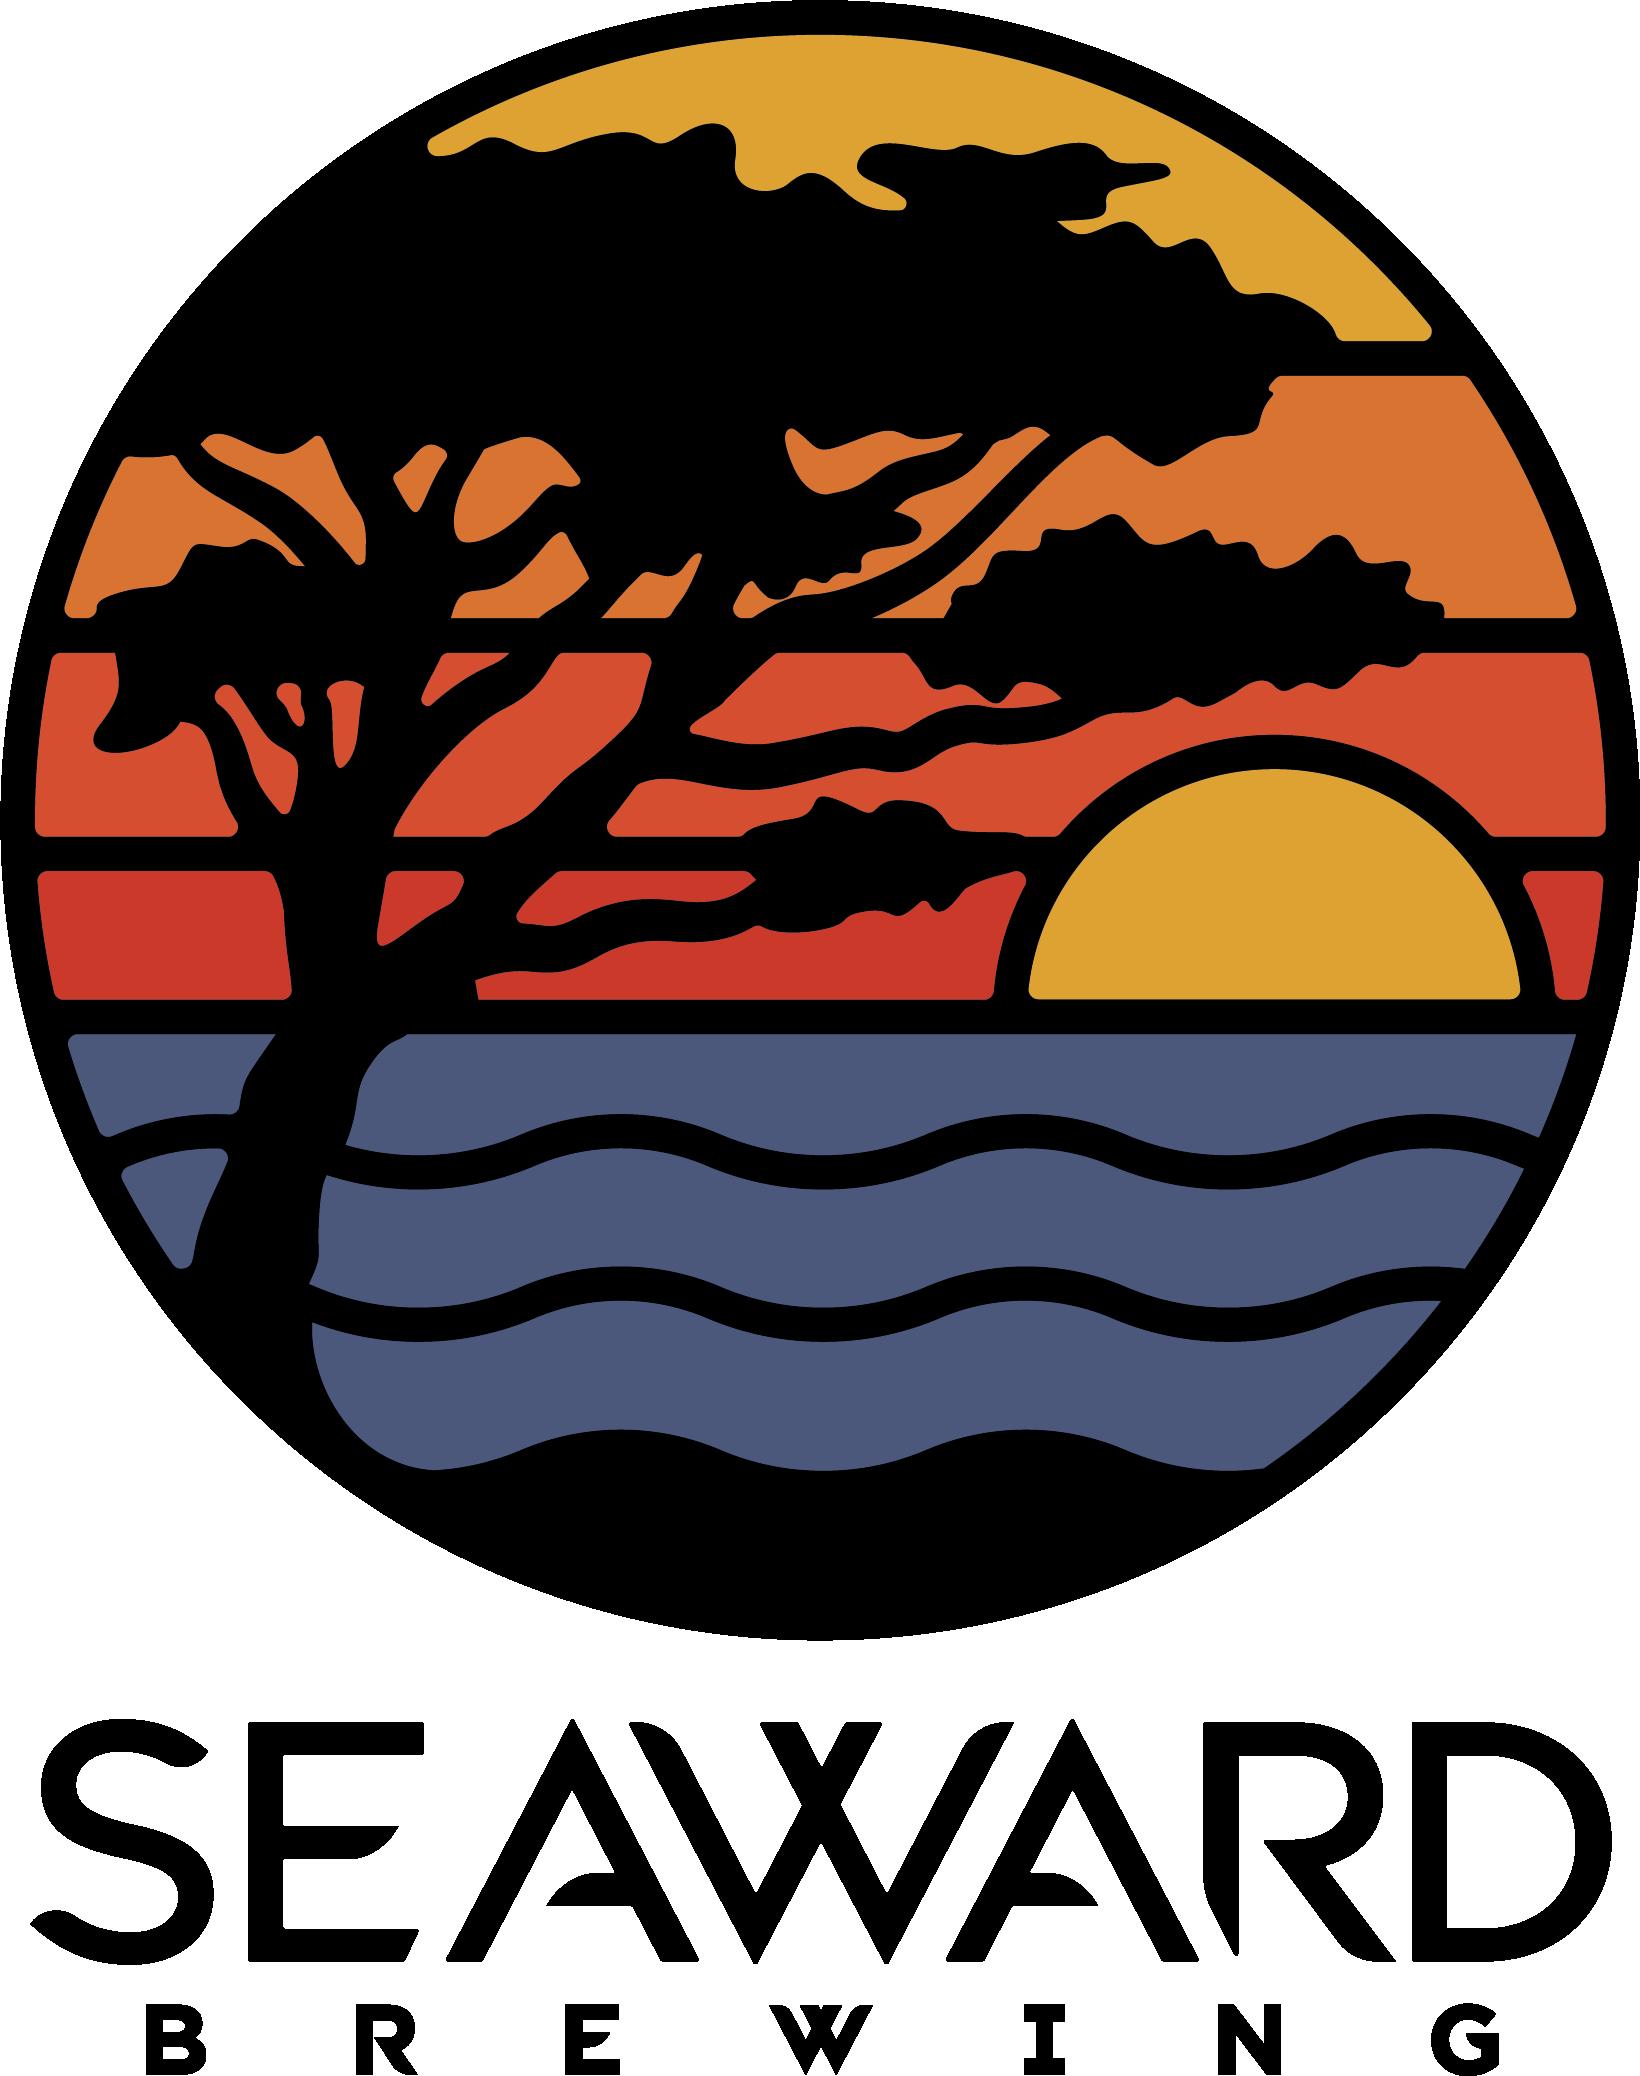 Seaward_Brewing_Circle_Color.png